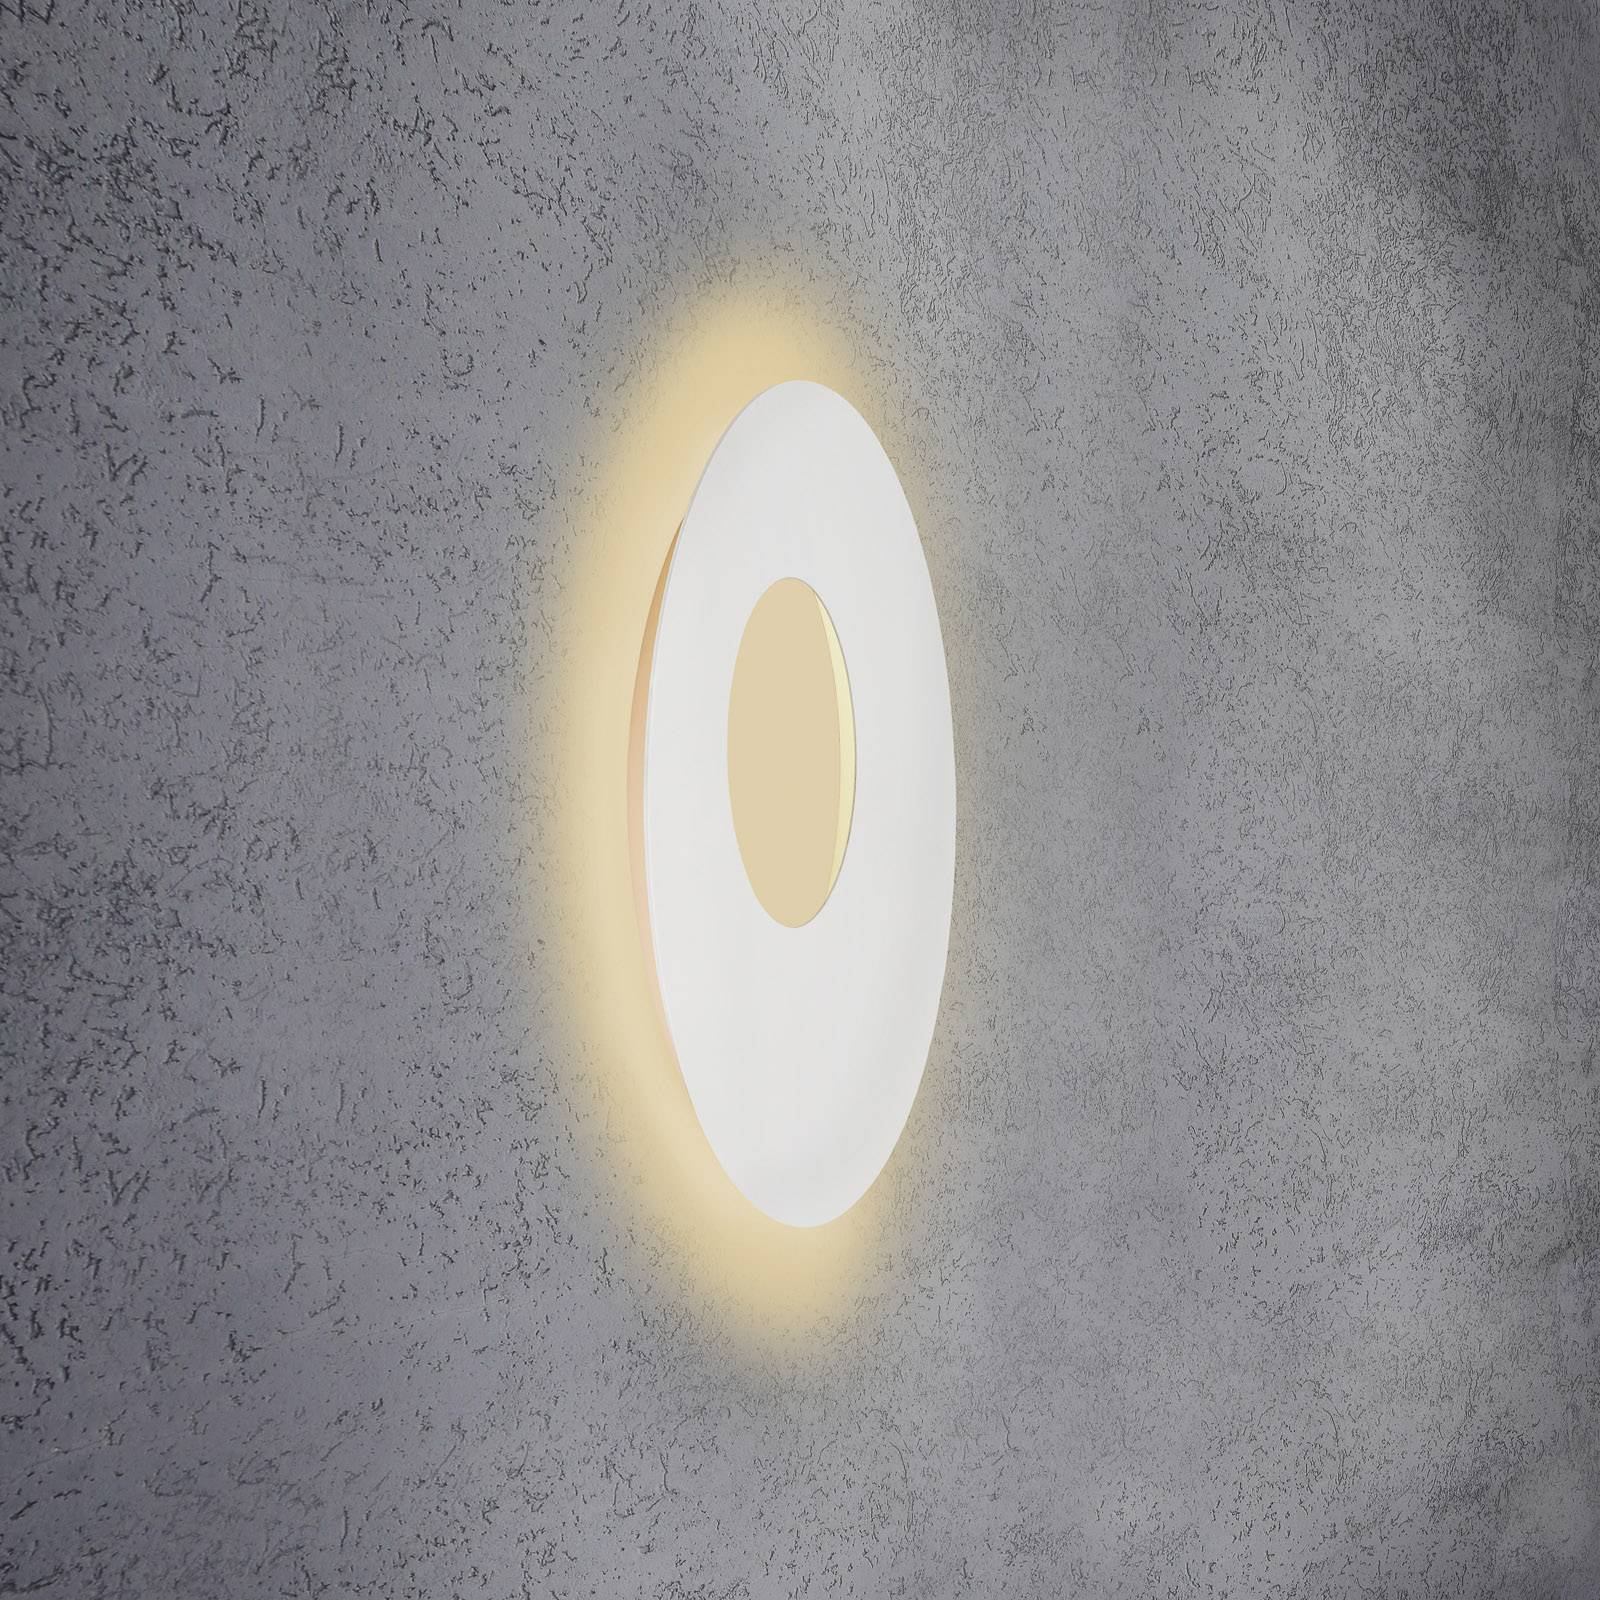 Escale Blade Open LED-vegglampe, hvit, Ø 59 cm